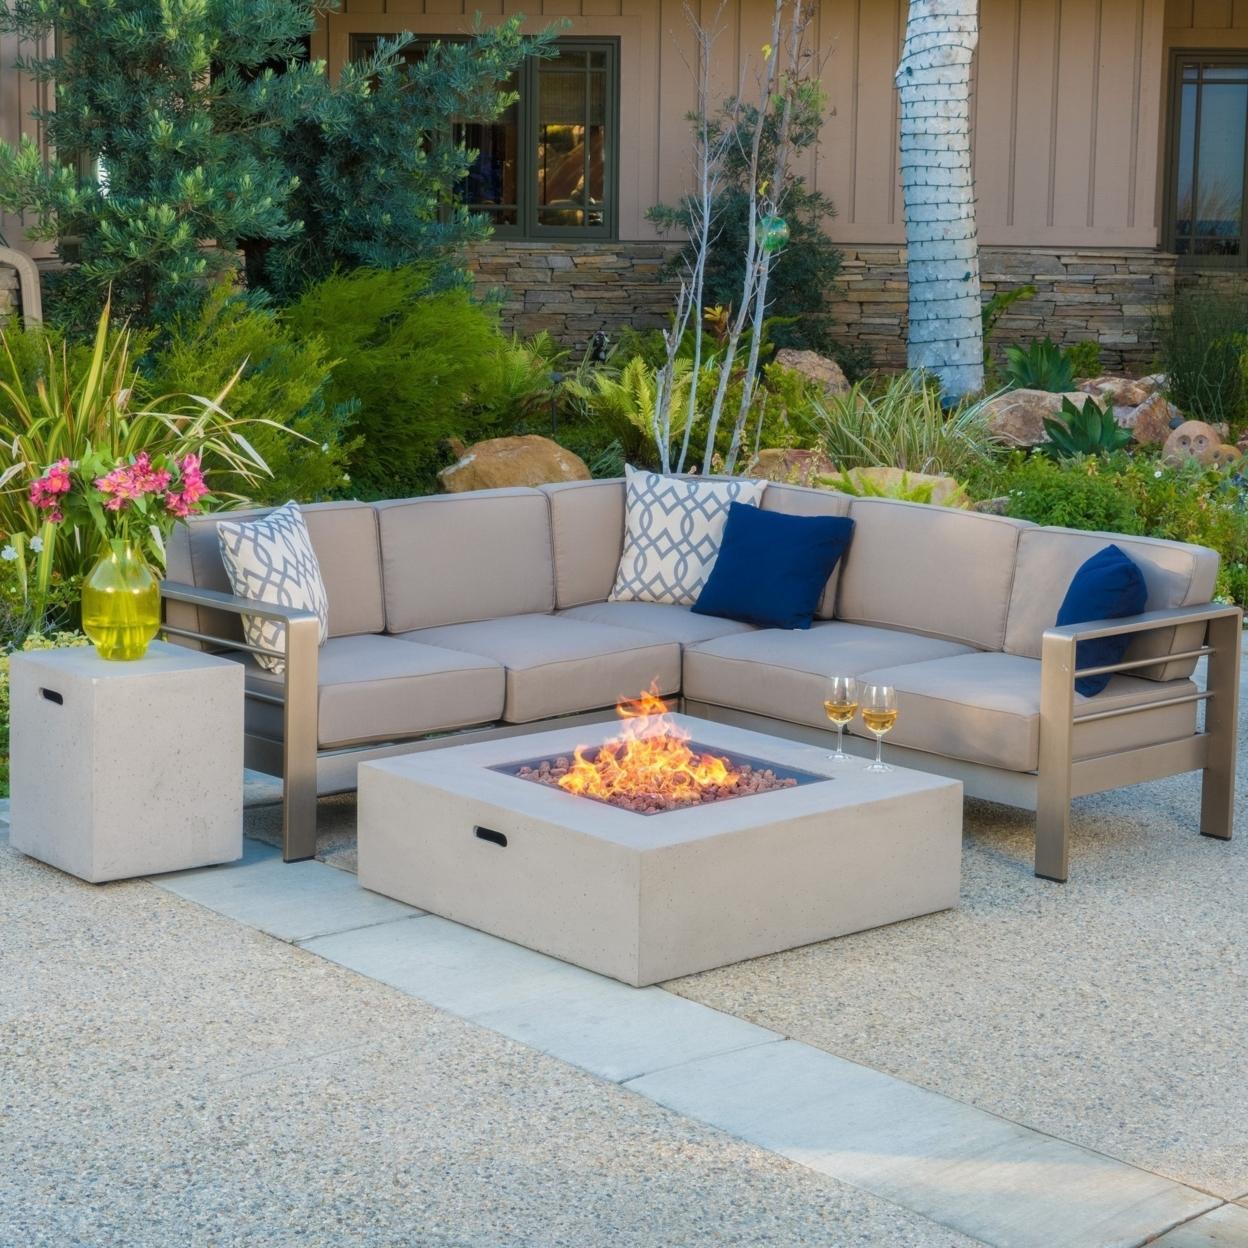 Crested-bay V-shape Outdoor Fire Table Sofa Set Light Gray